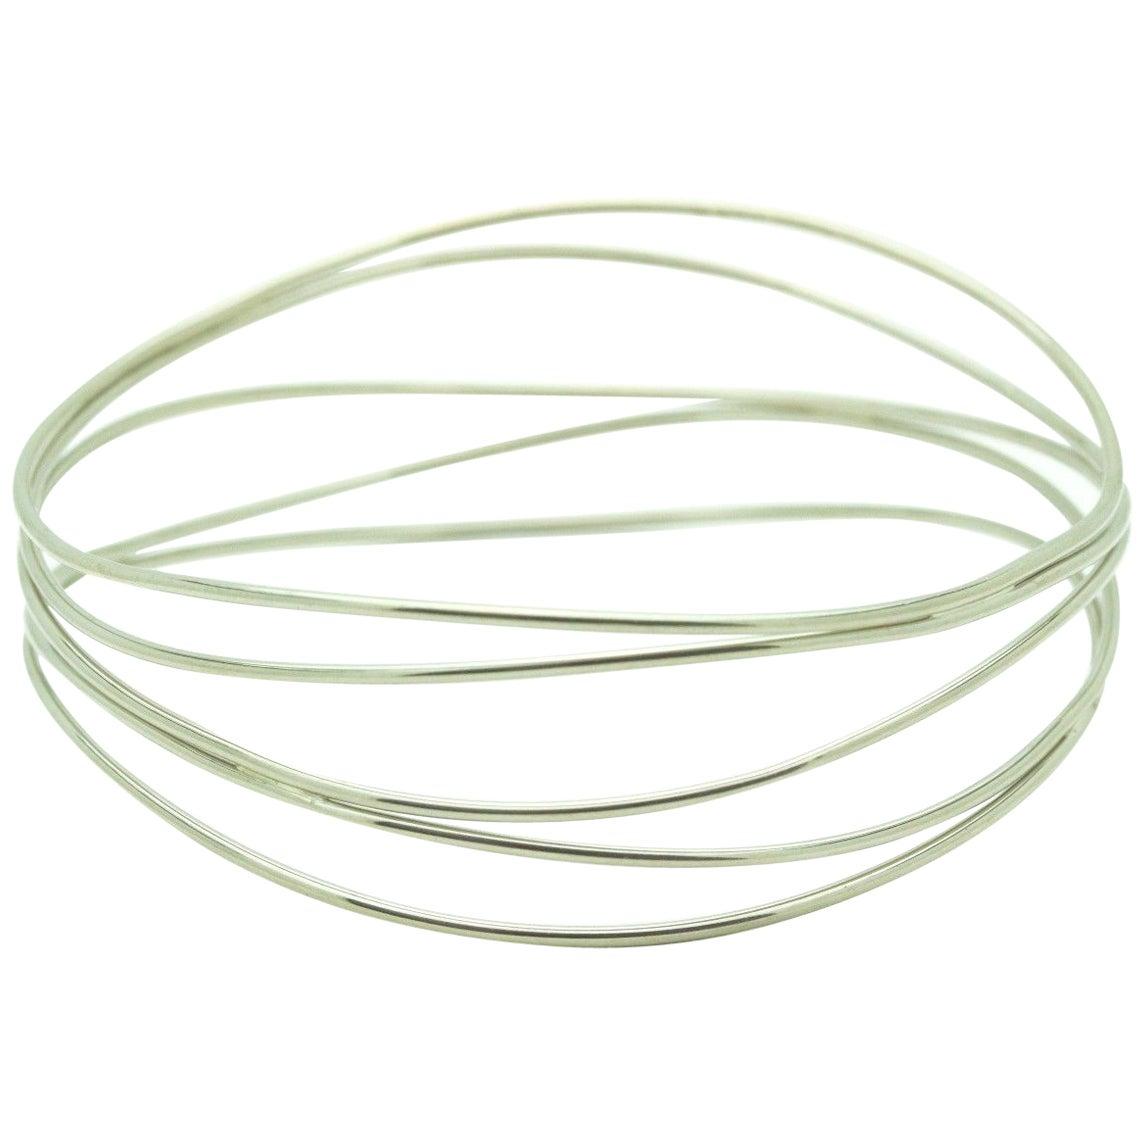 Tiffany & Co. Elsa Peretti 18 Karat White Gold Five-Row Wave Bracelet